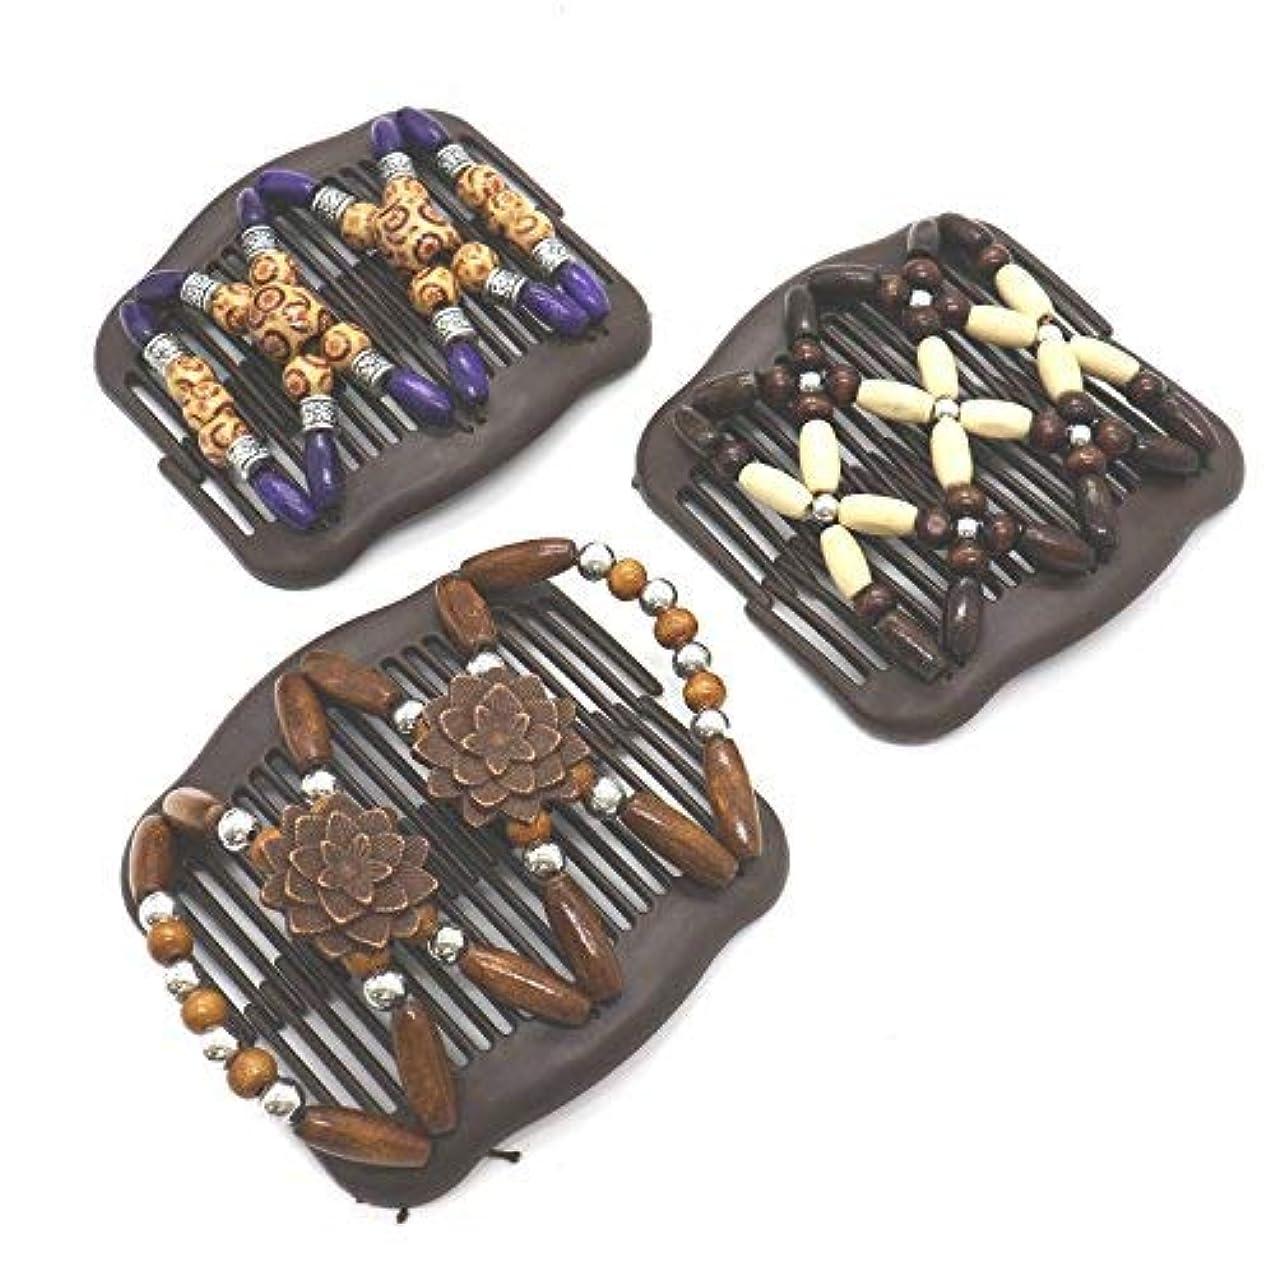 意識九時四十五分脚本Buorsa 3Pcs Magic Combs Wood Beaded Stretch Double Side Combs Clips Bun Maker Hair Accessories for Wowen Girls...